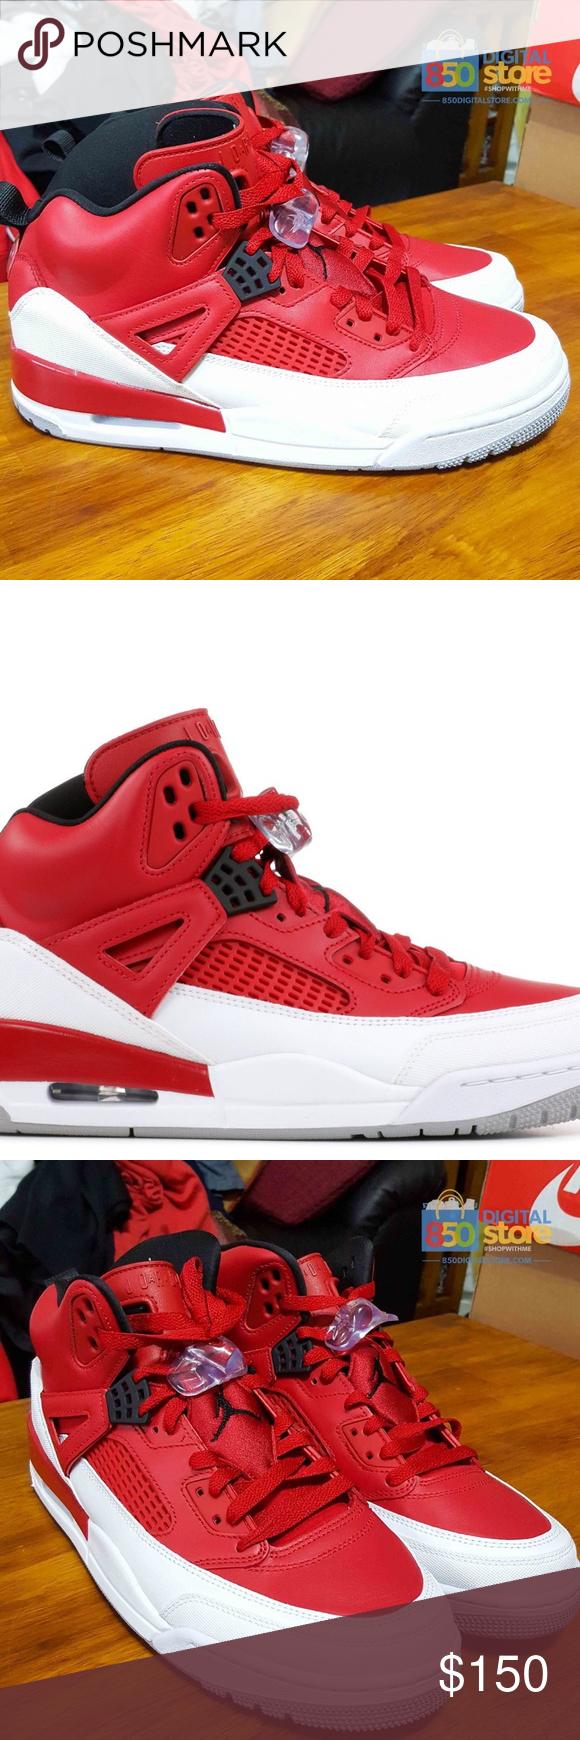 more photos 3f1b9 94b58 Air Jordan Spizike Red White size 10.5 315371-603 Nike AIR JORDAN SPIZIKE  BULLS Basketball